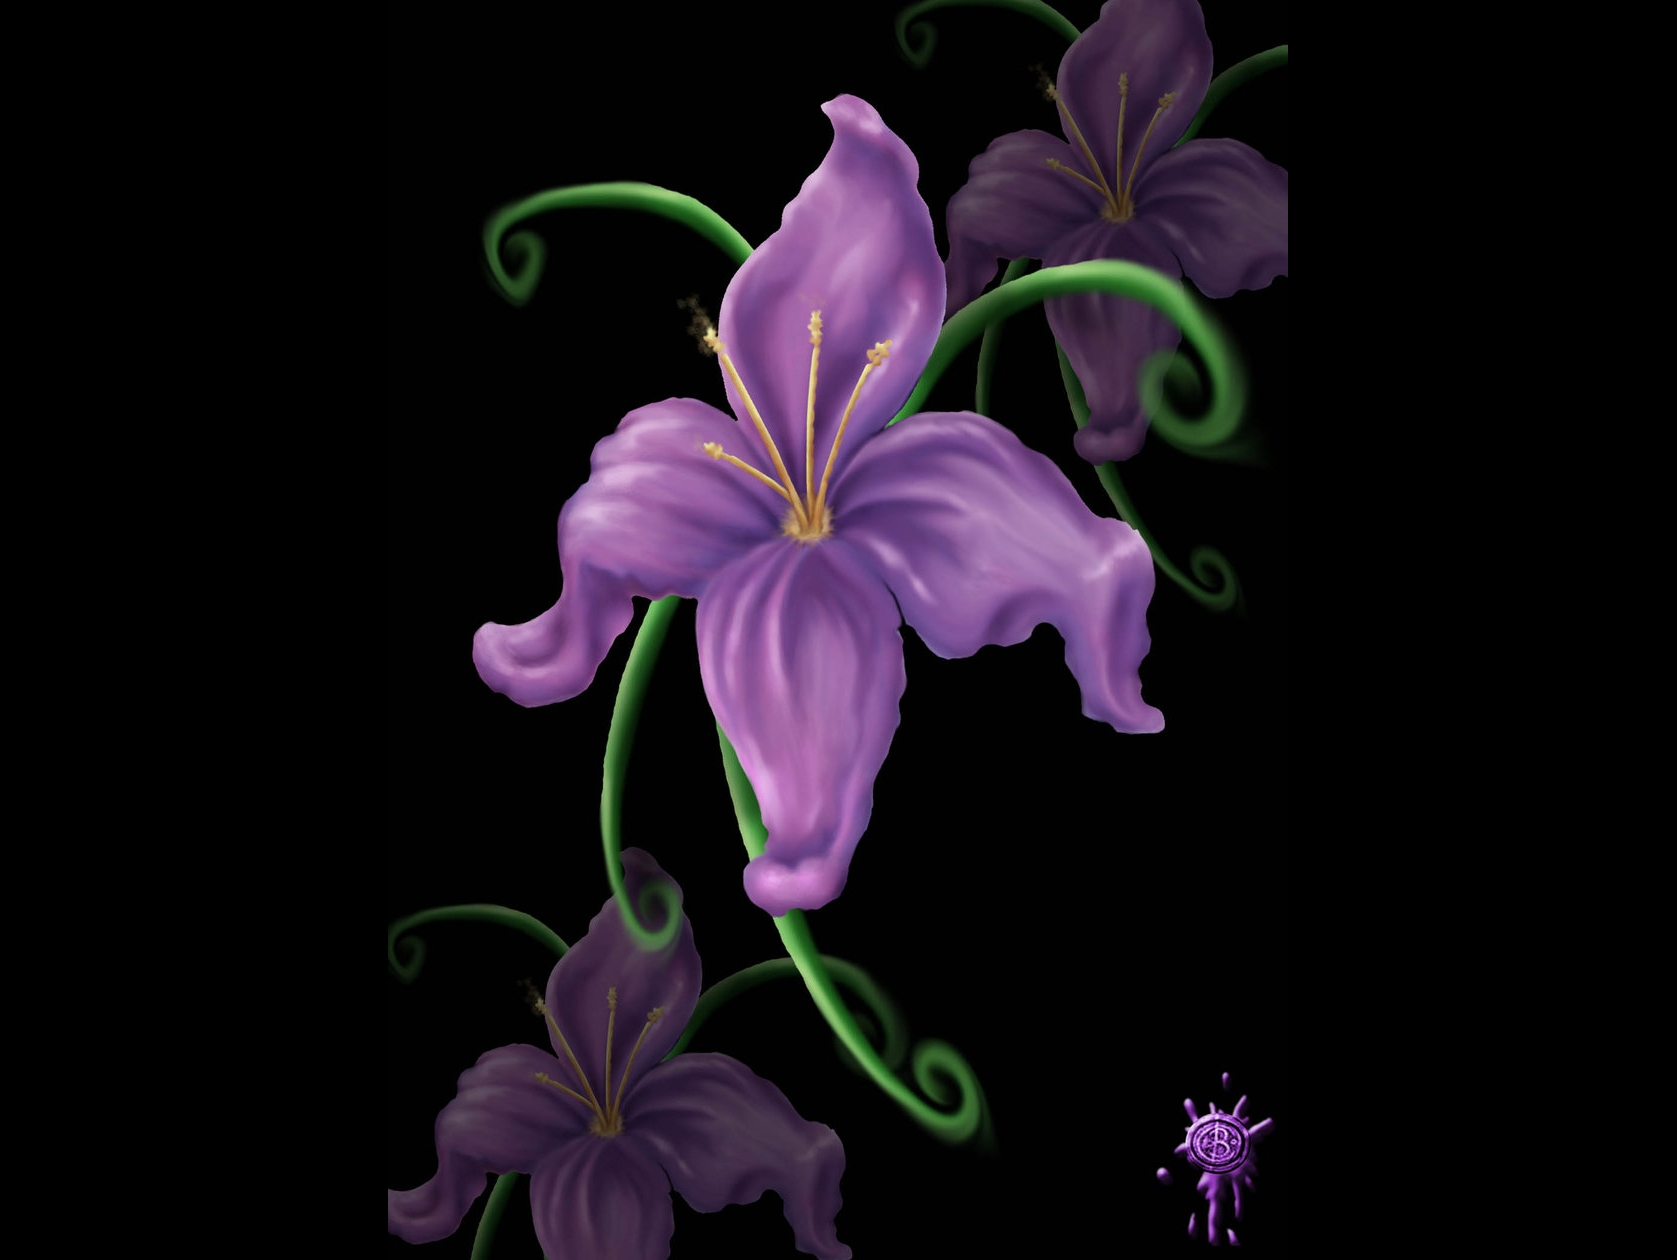 Image lilies flowers izmirmasajfo